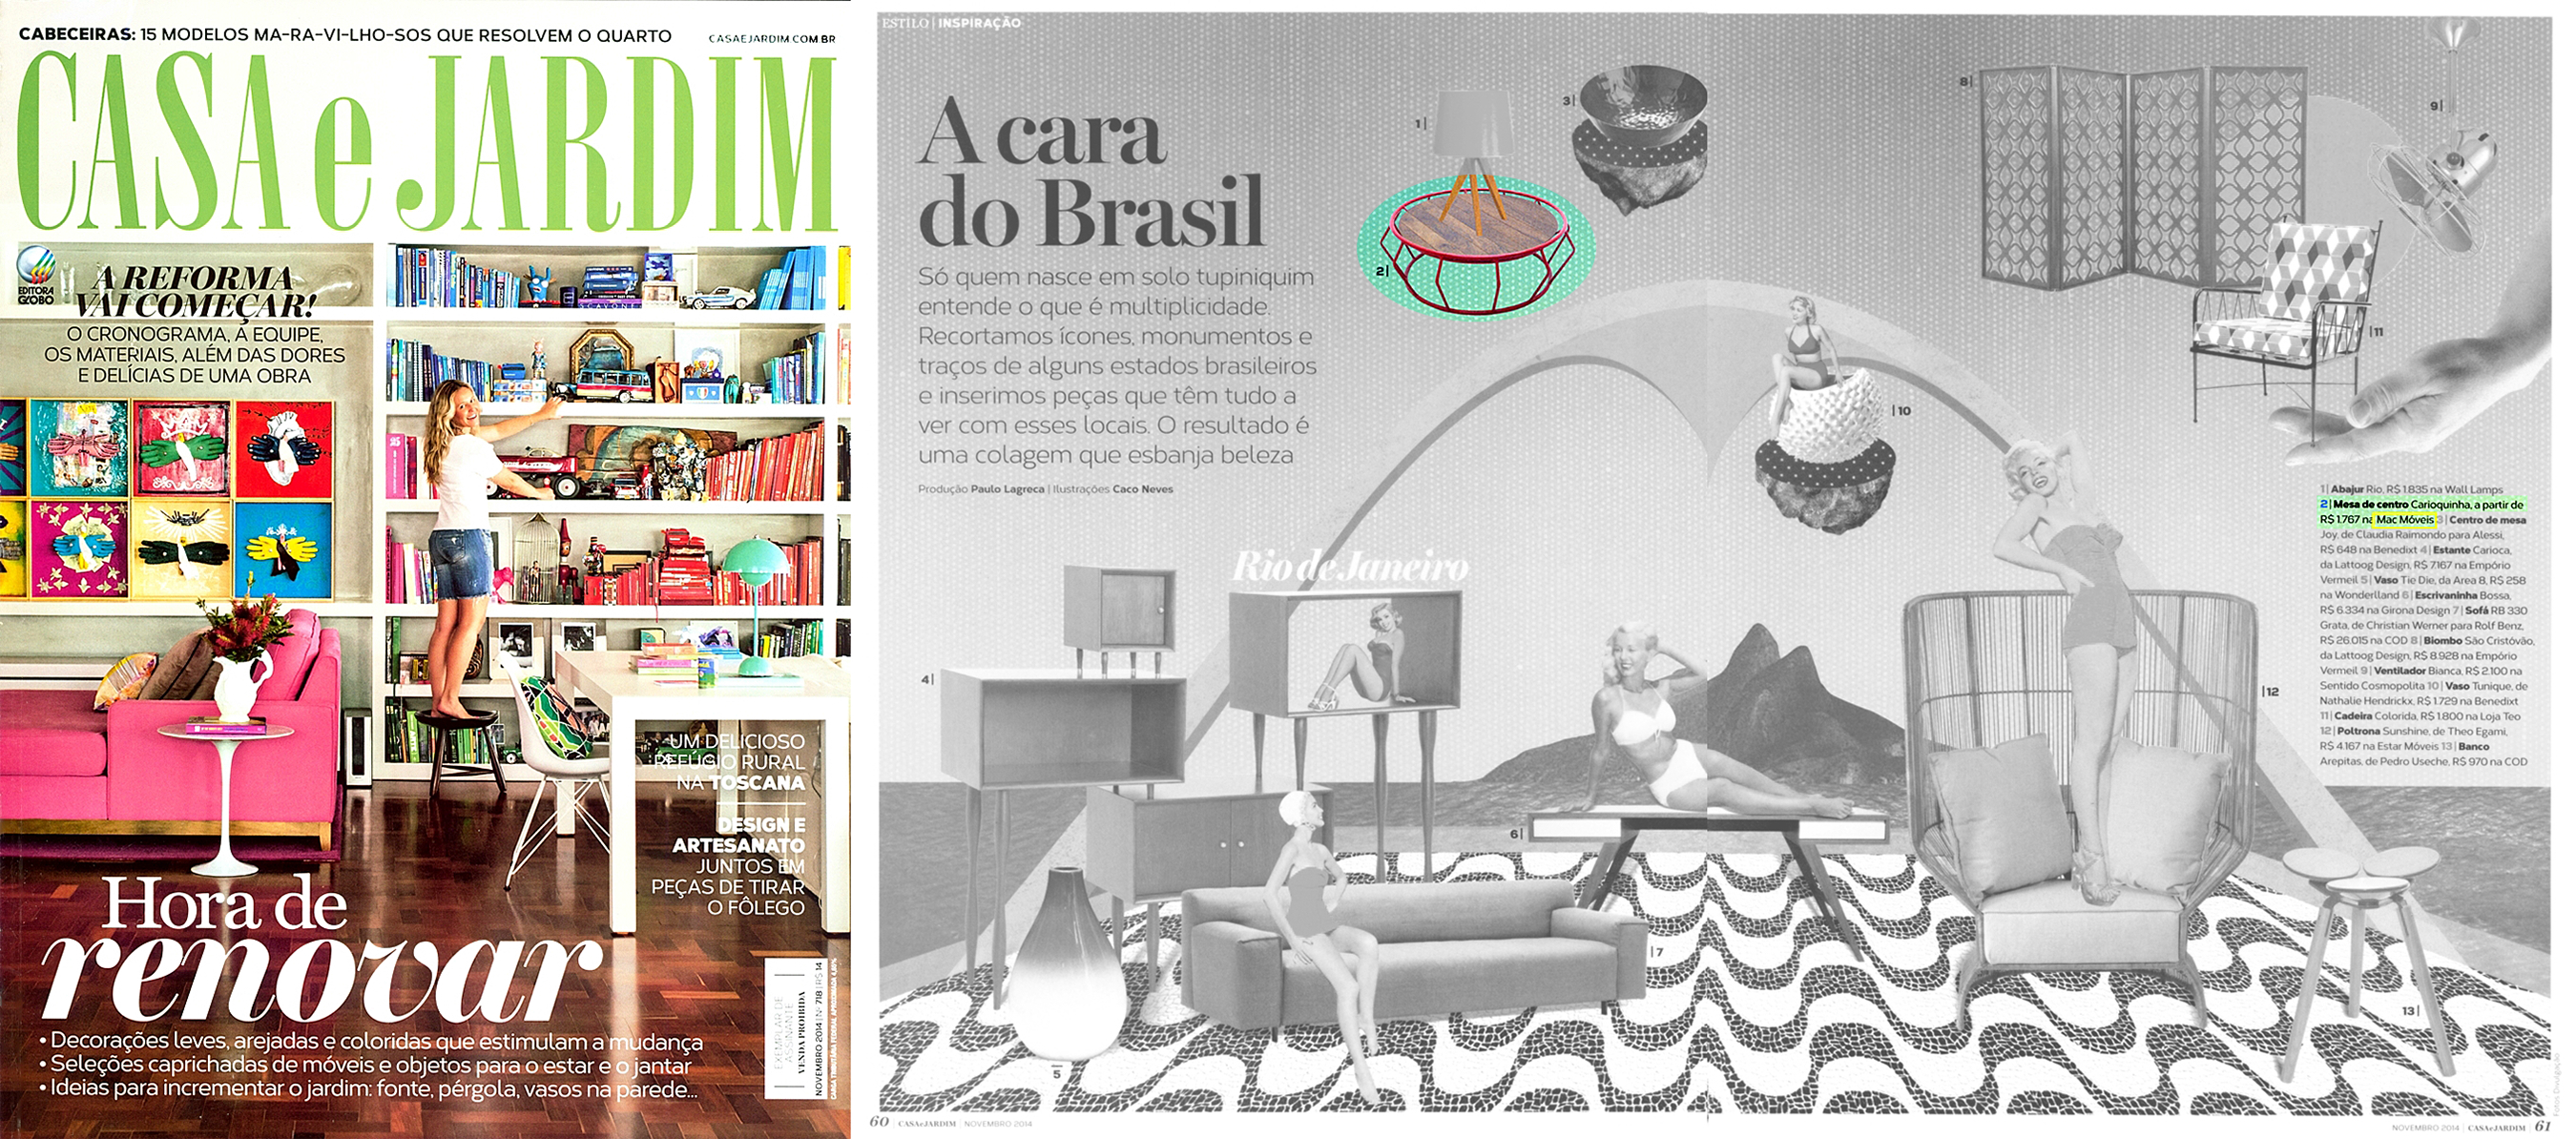 Casa e Jardim nº 718 - November 2014